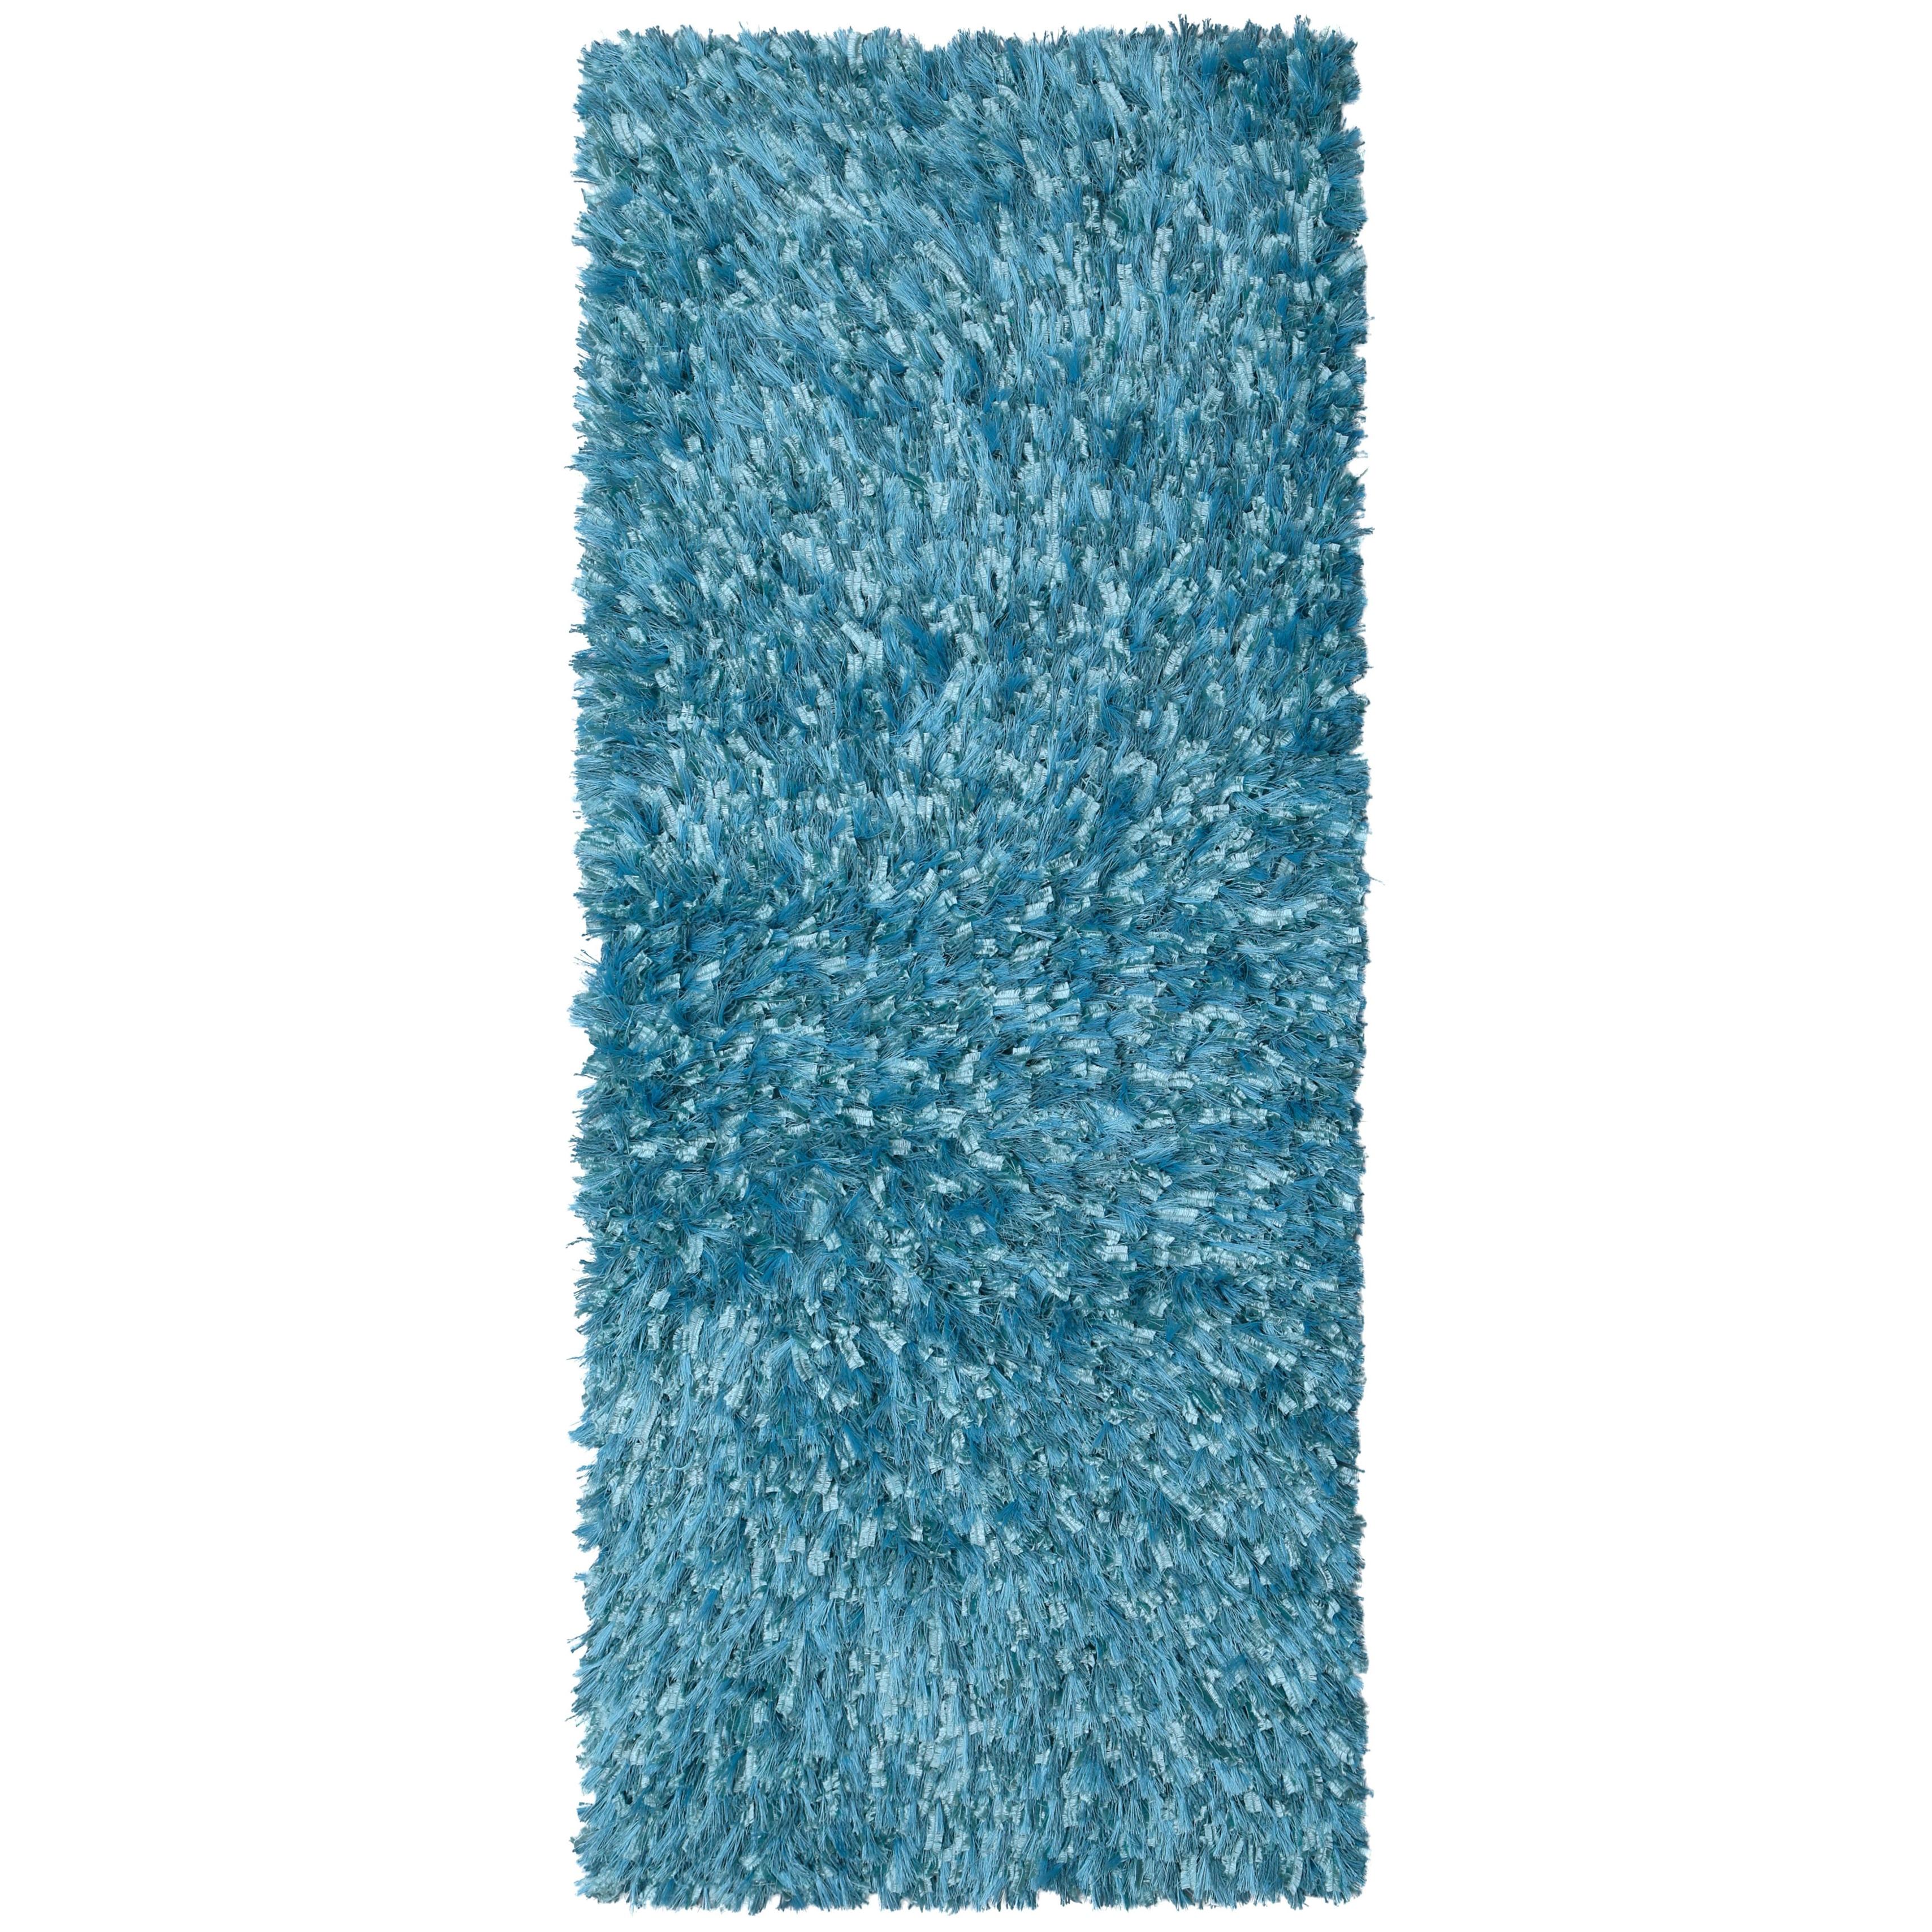 Blue Shimmer Shag Rug